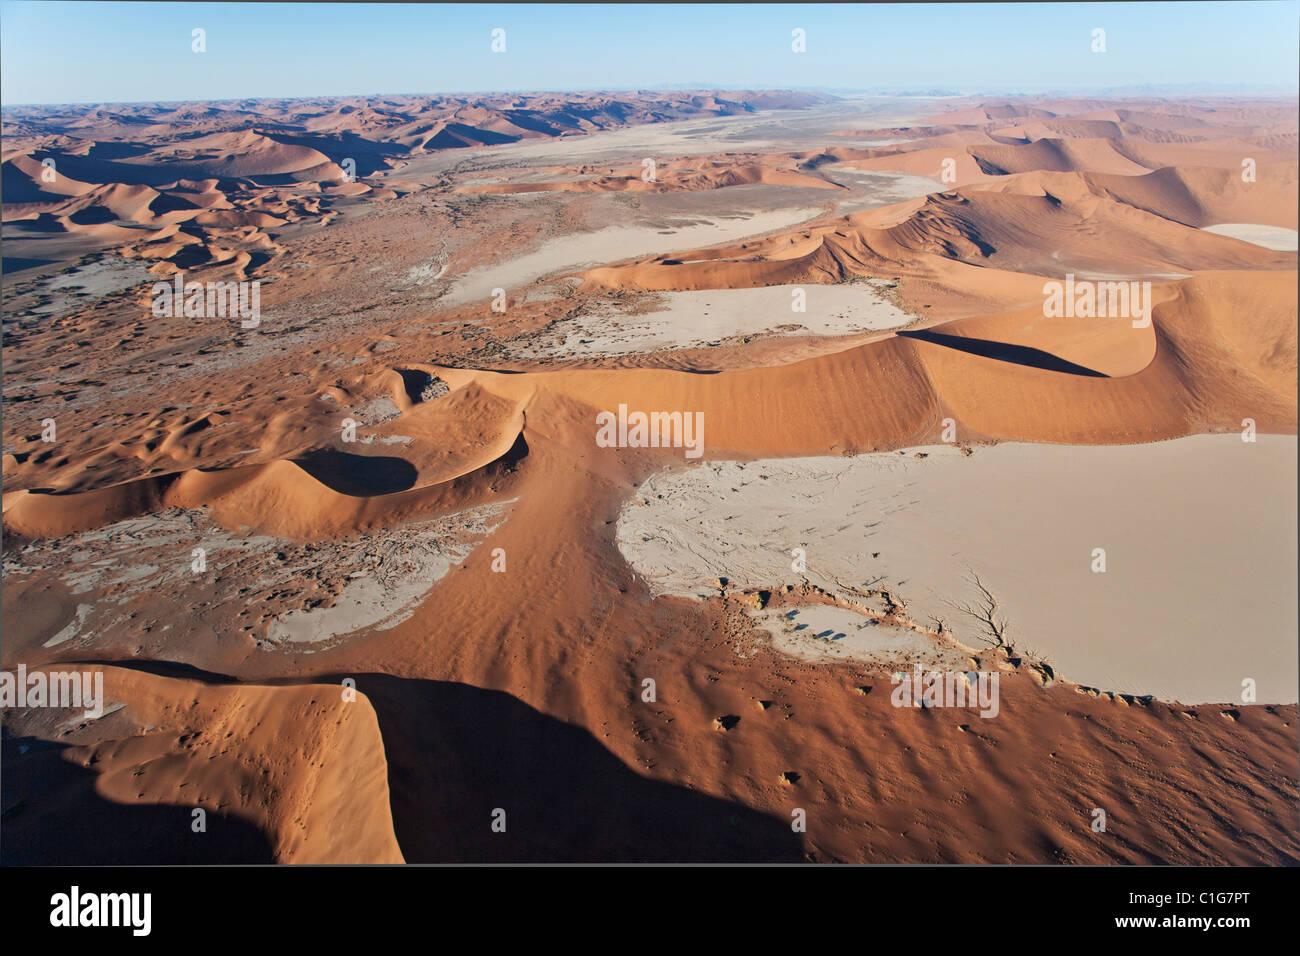 Dead Vlei in Sossusvlei in the Namib desert. Namib-Naukluft N.P, Namibia - Stock Image